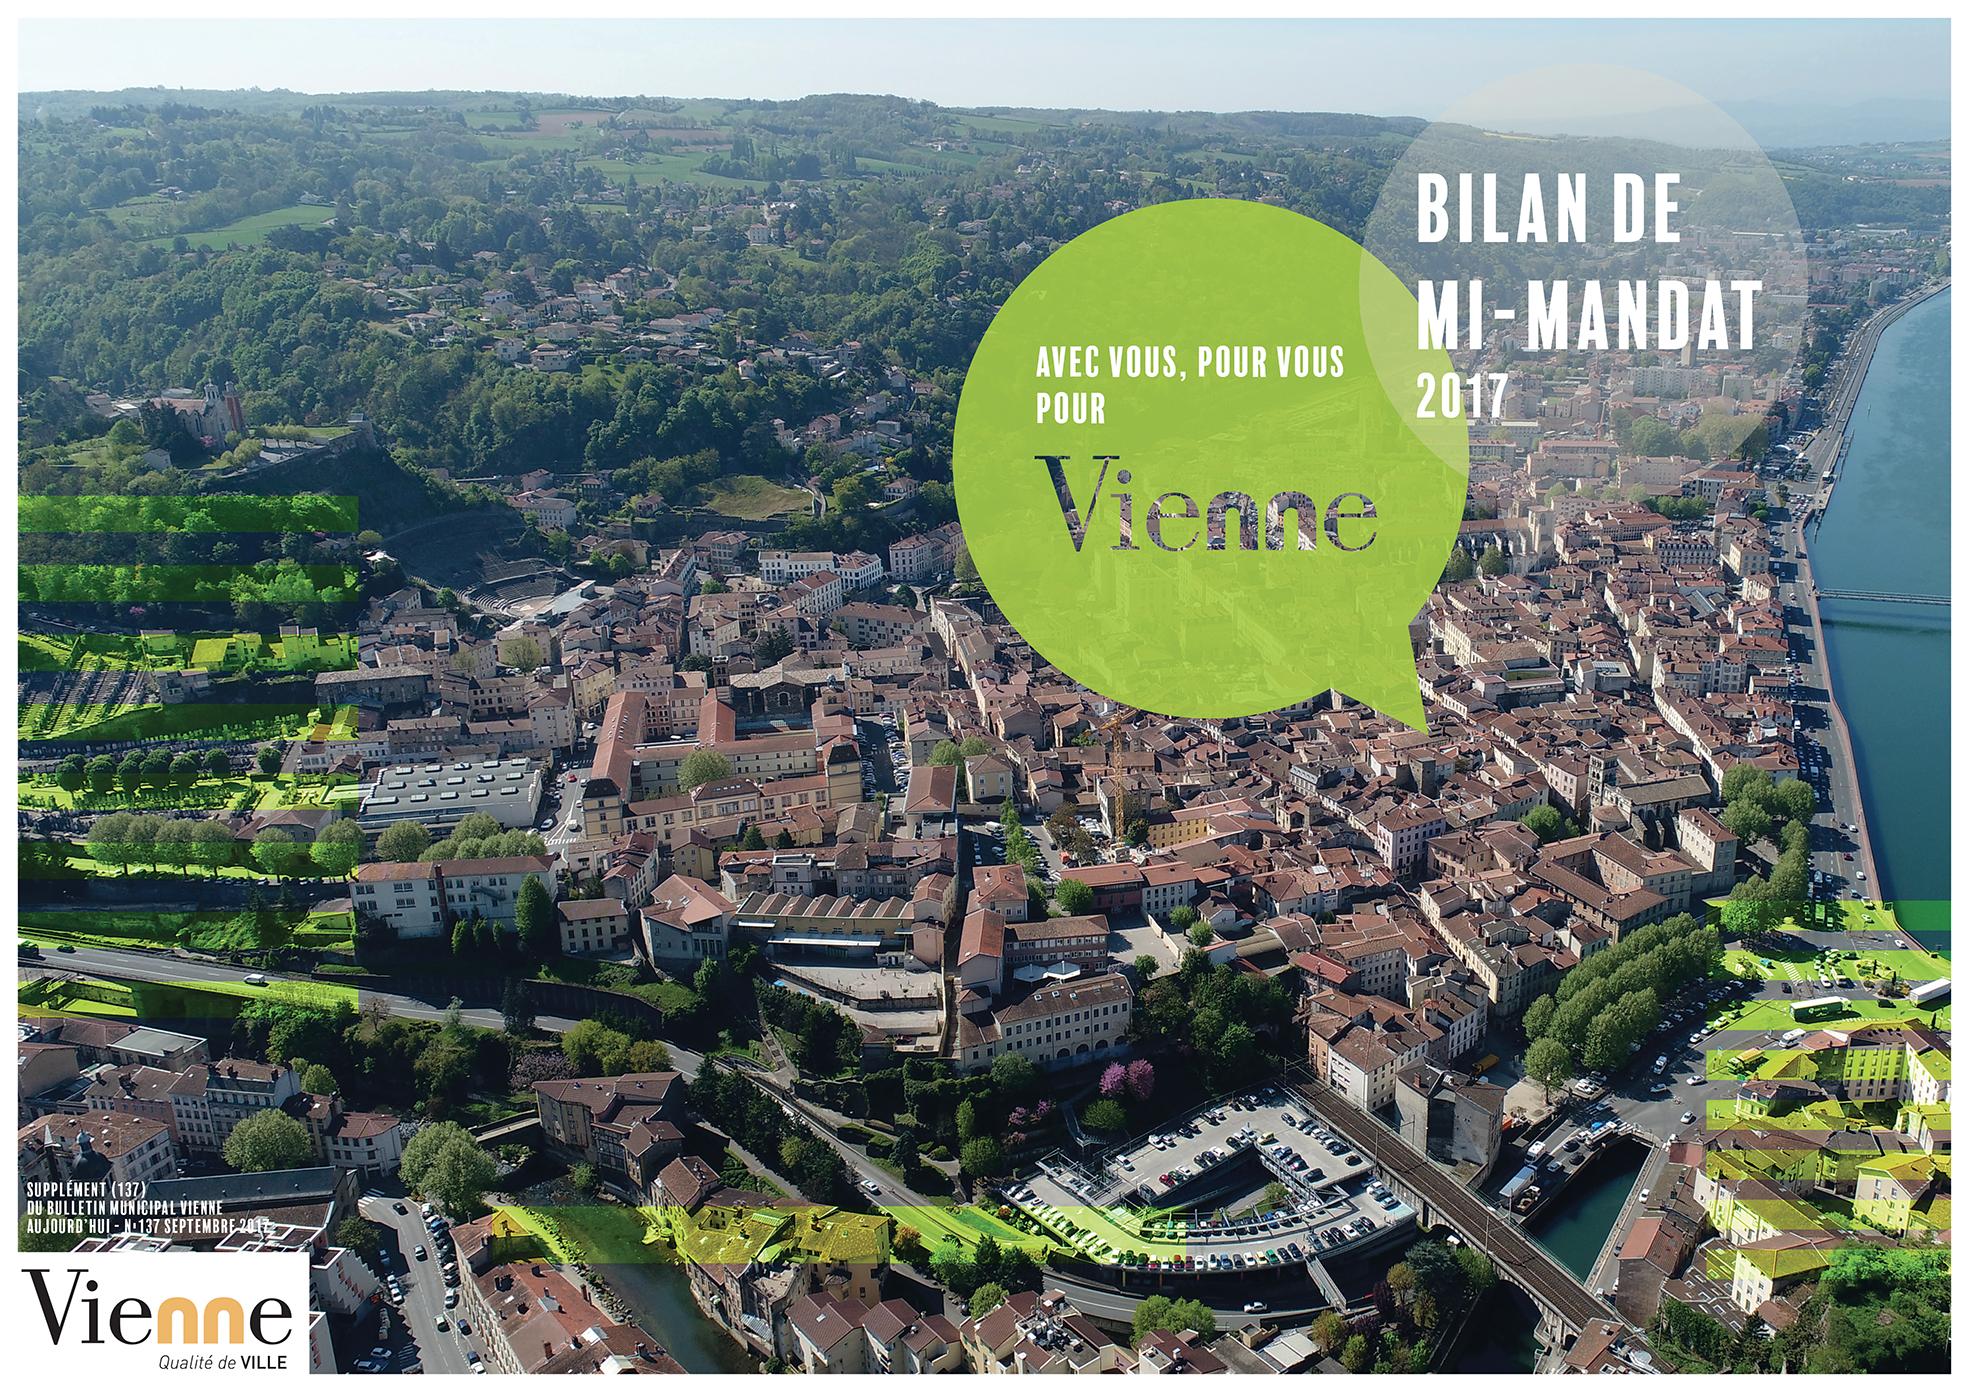 Bilan de mandat Vienne